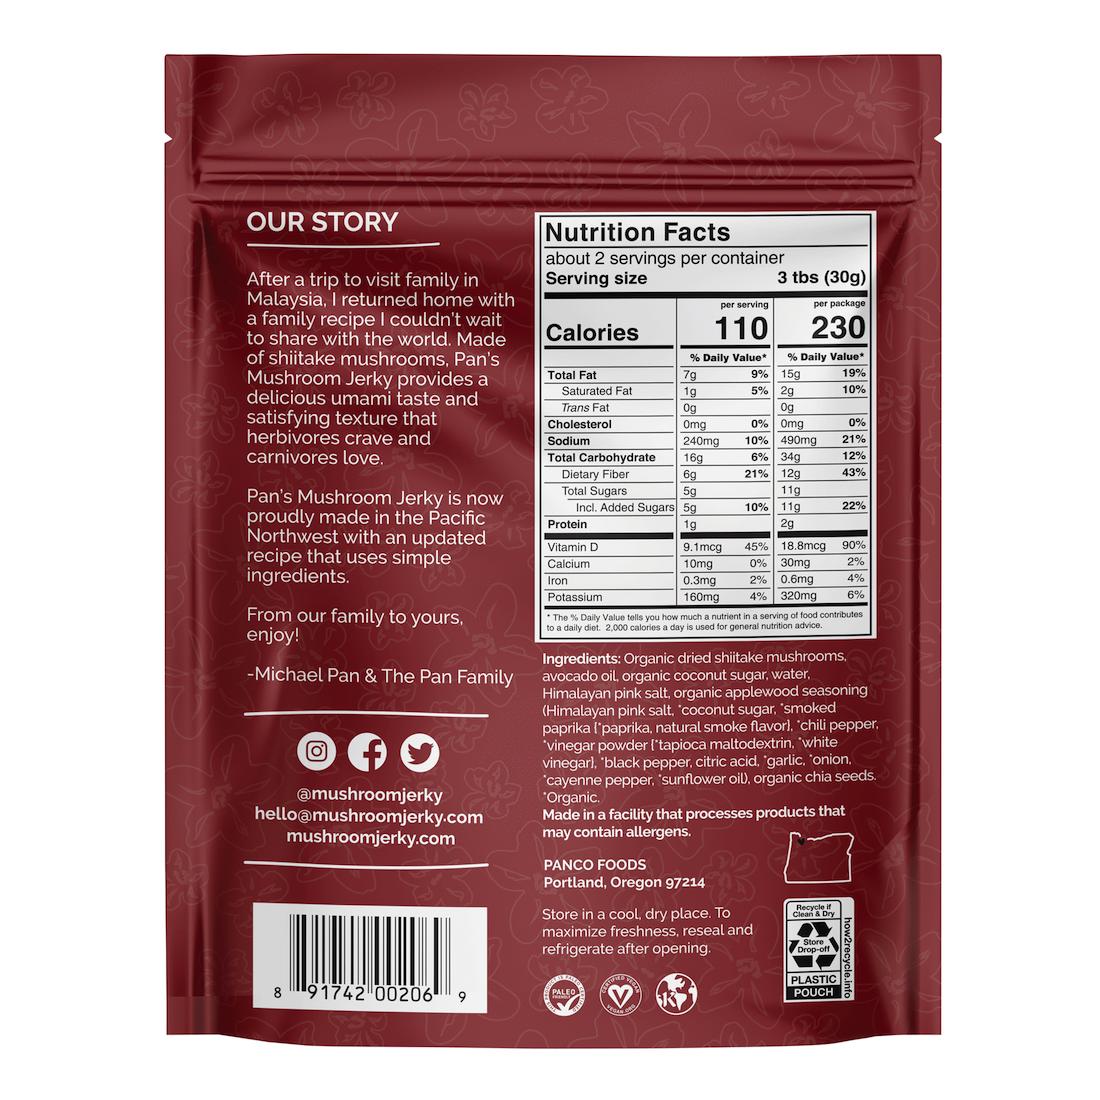 Applewood BBQ - Pan's Mushroom Jerky - Certified Paleo Friendly, PaleoVegan by the Paleo Foundation